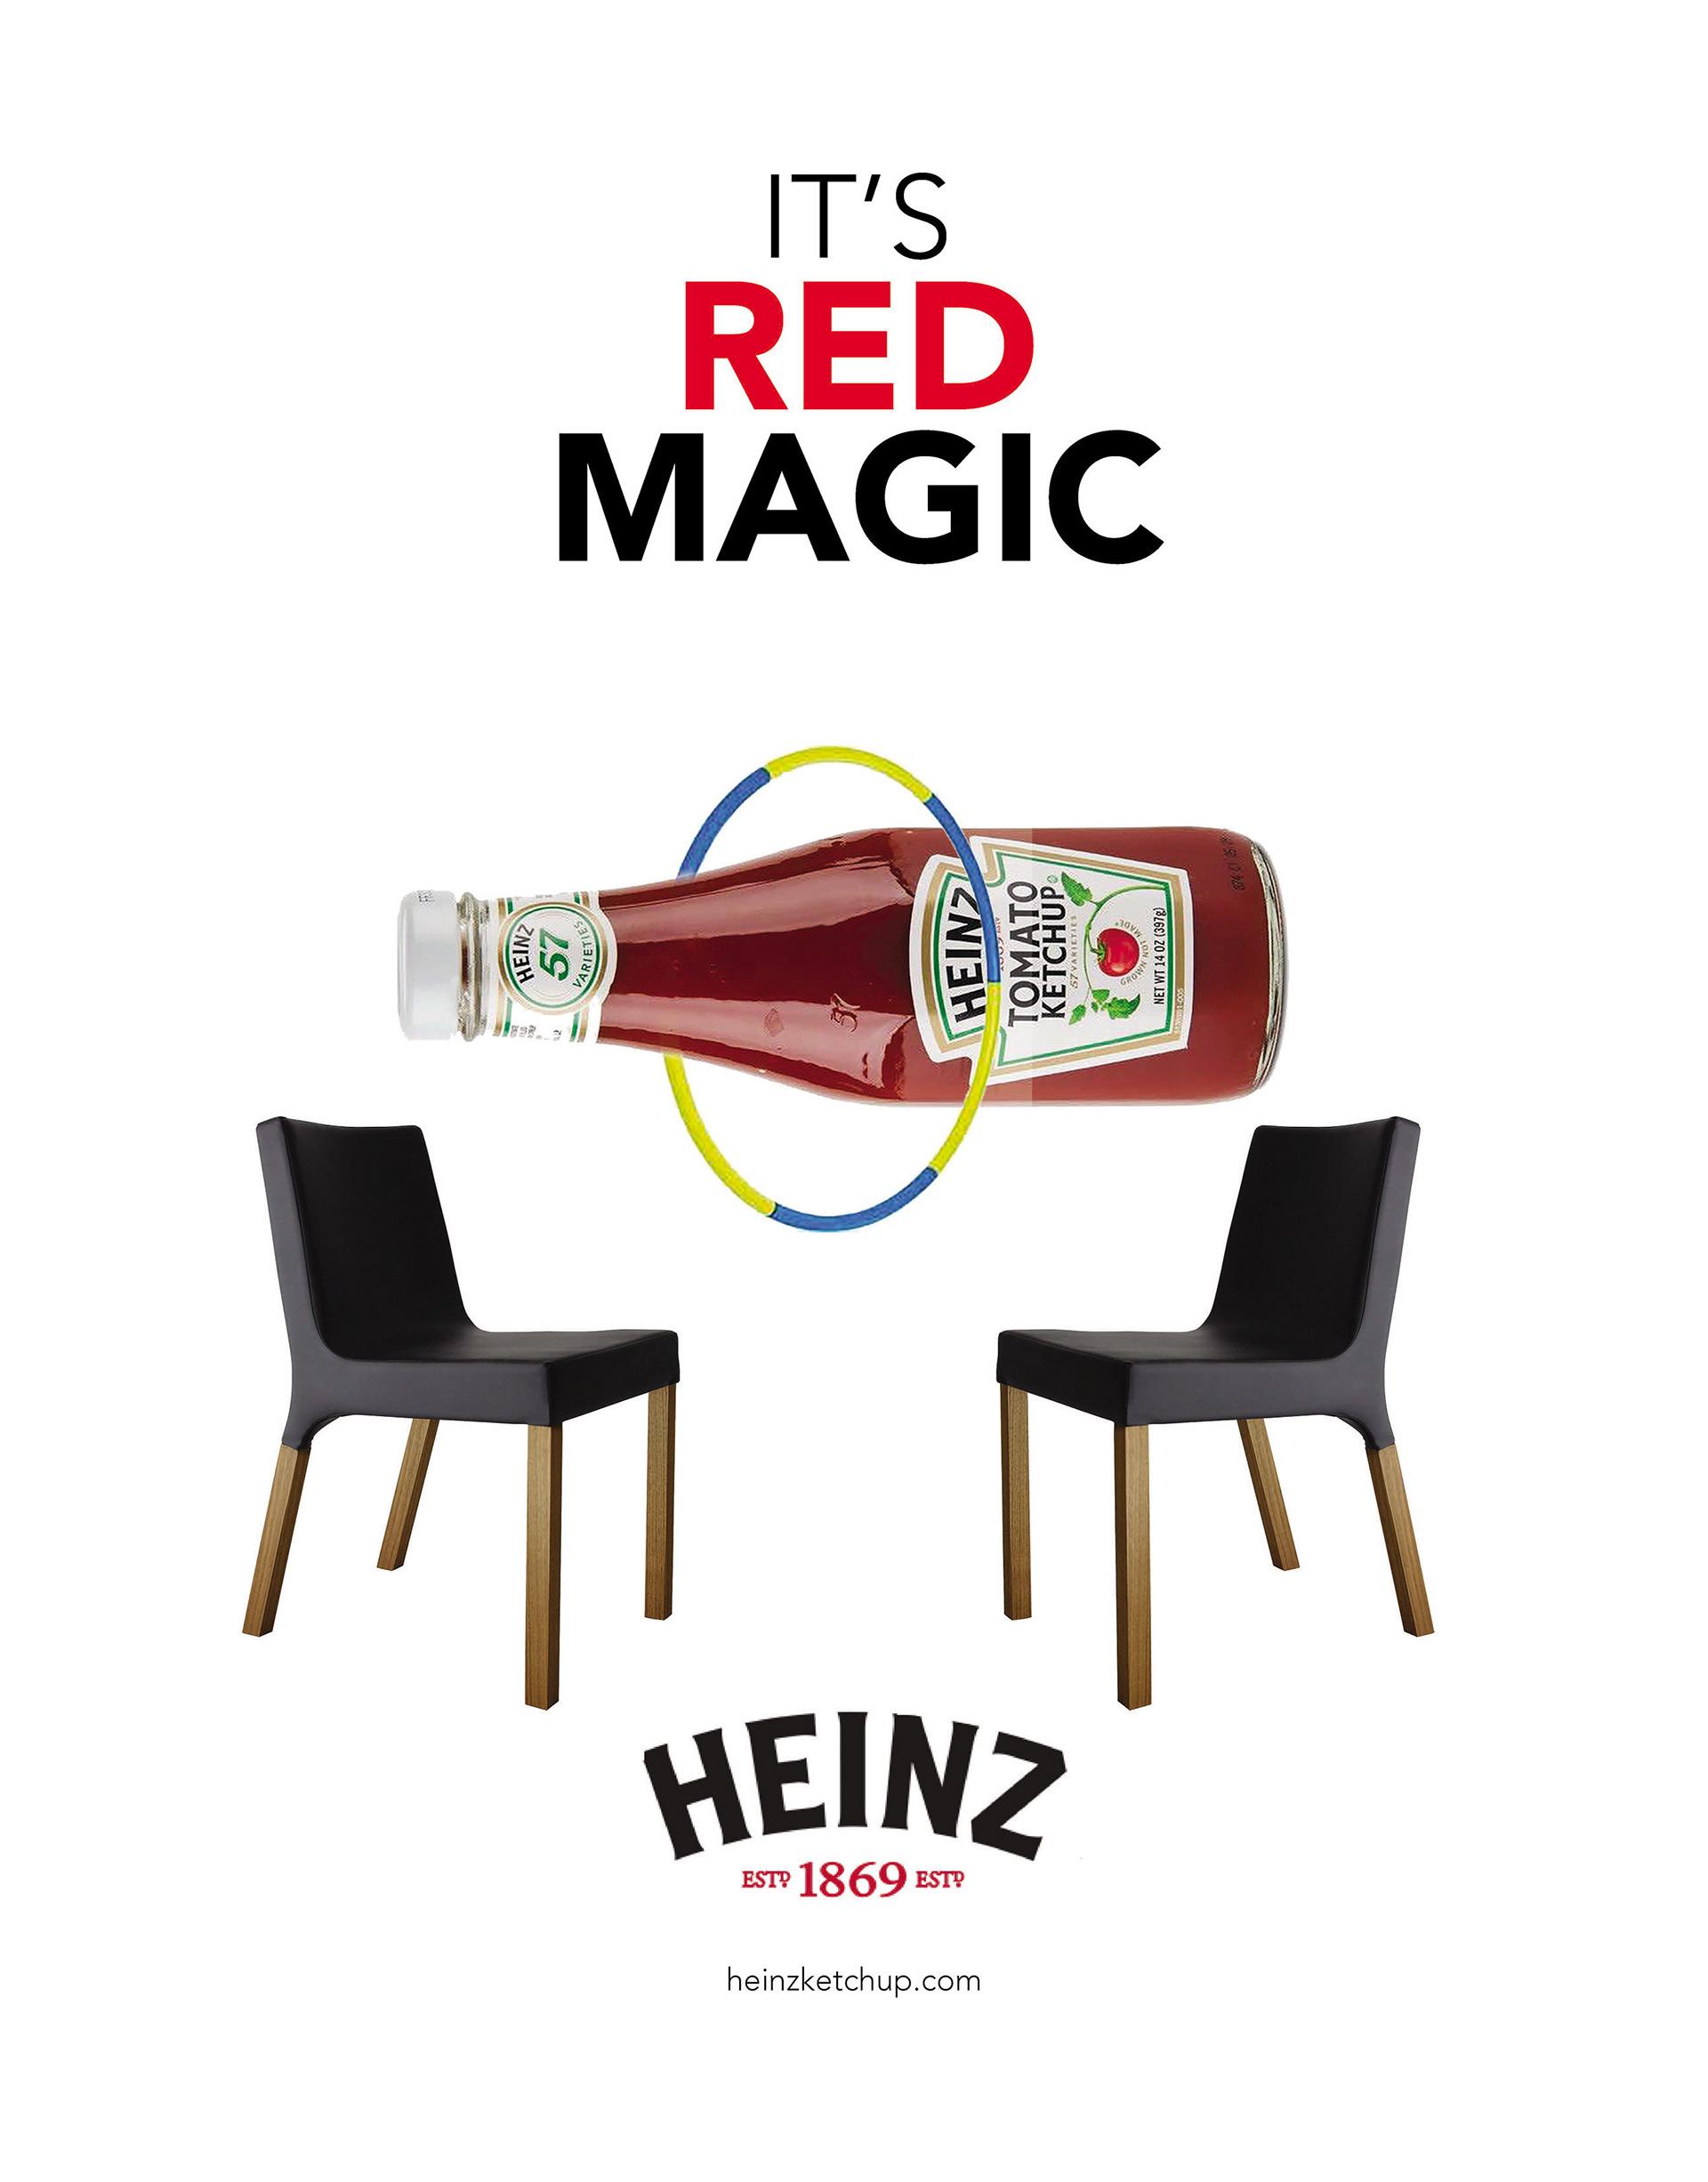 Rhetorical Analysis of the Heinz Red Magic Ad.